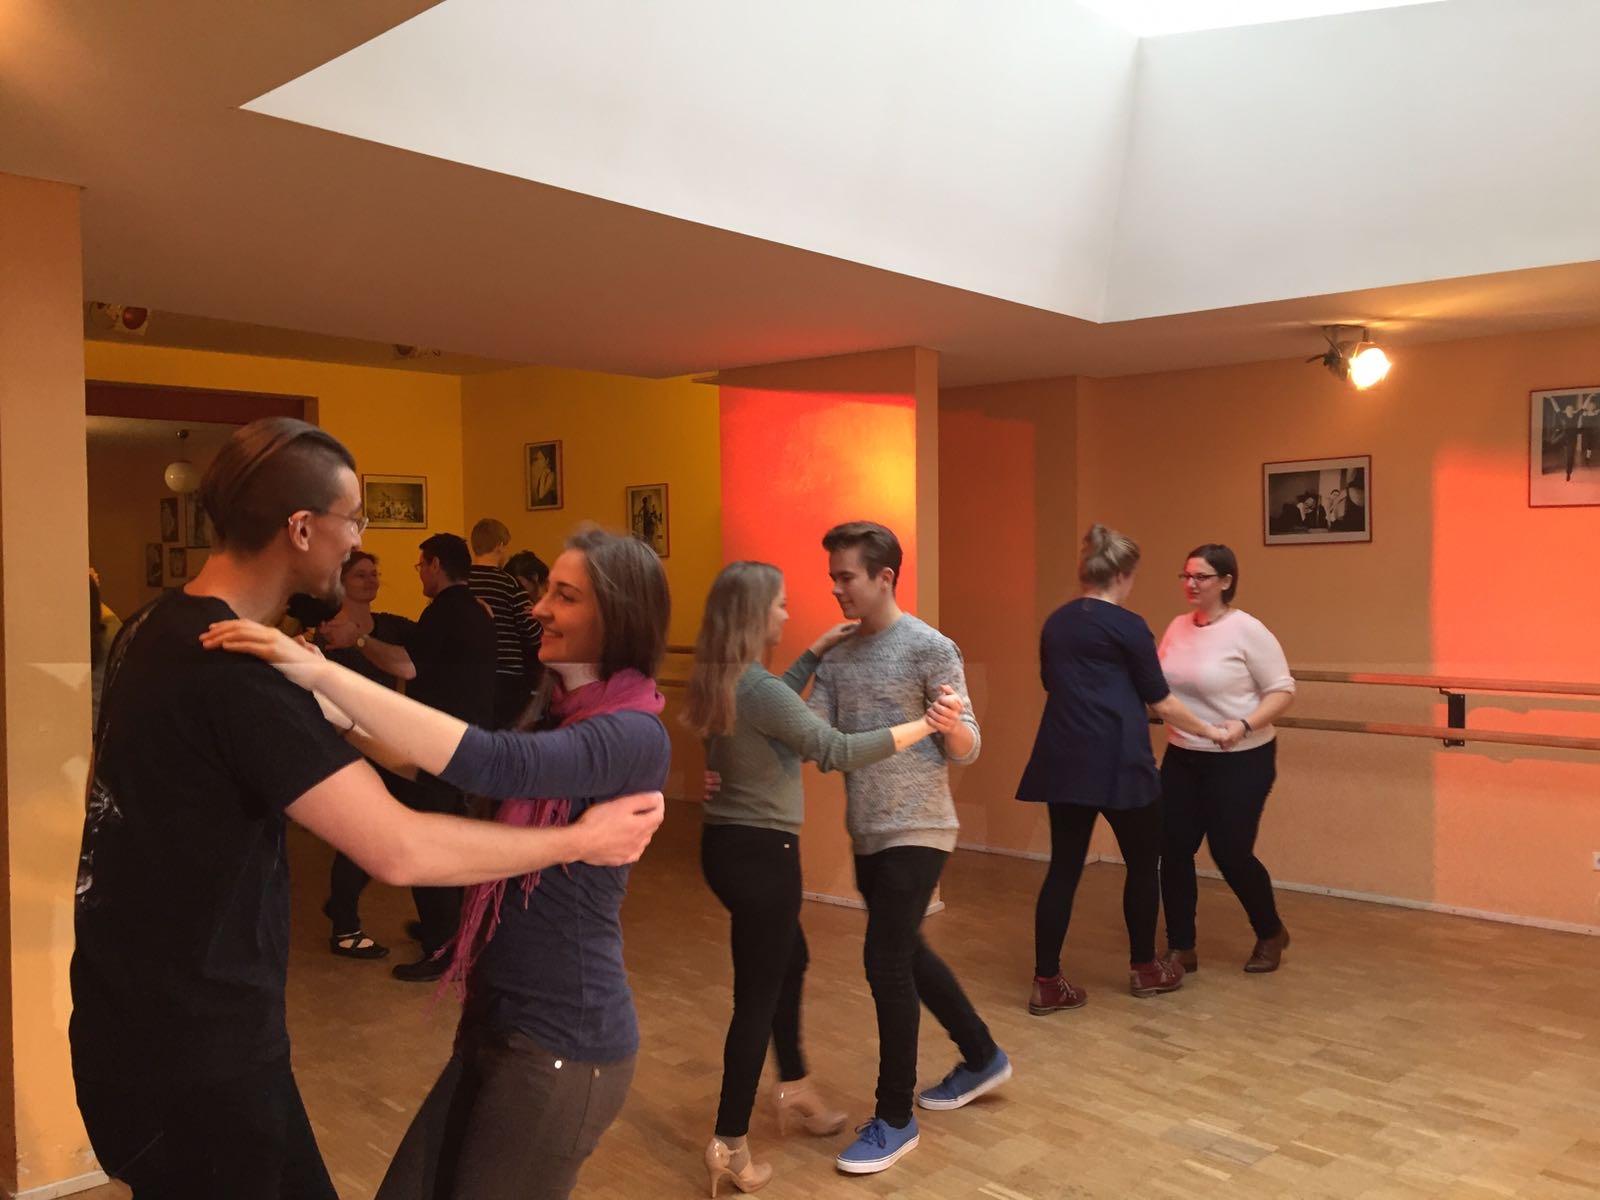 Single tanzkurs halle saale